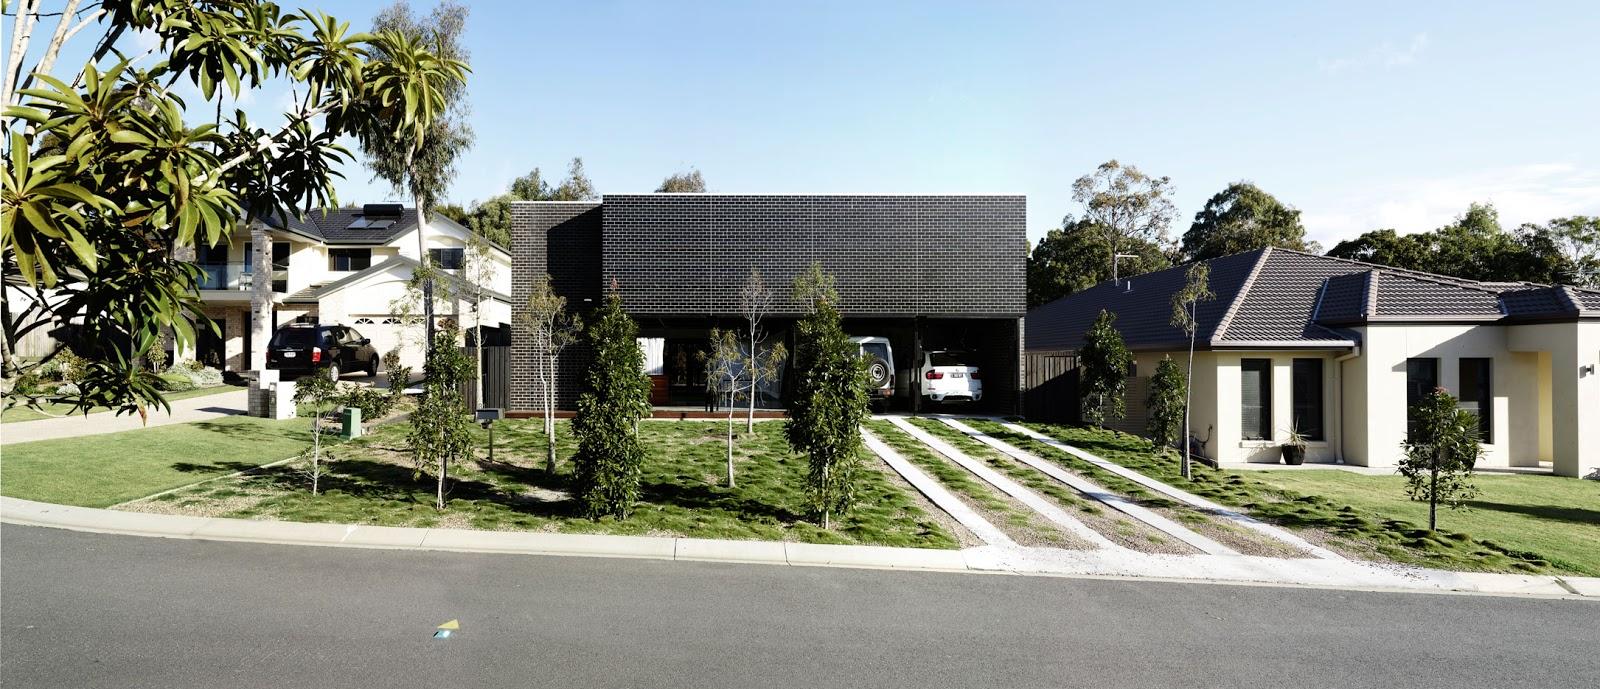 Simplicity Love Bisley Place House Australia James